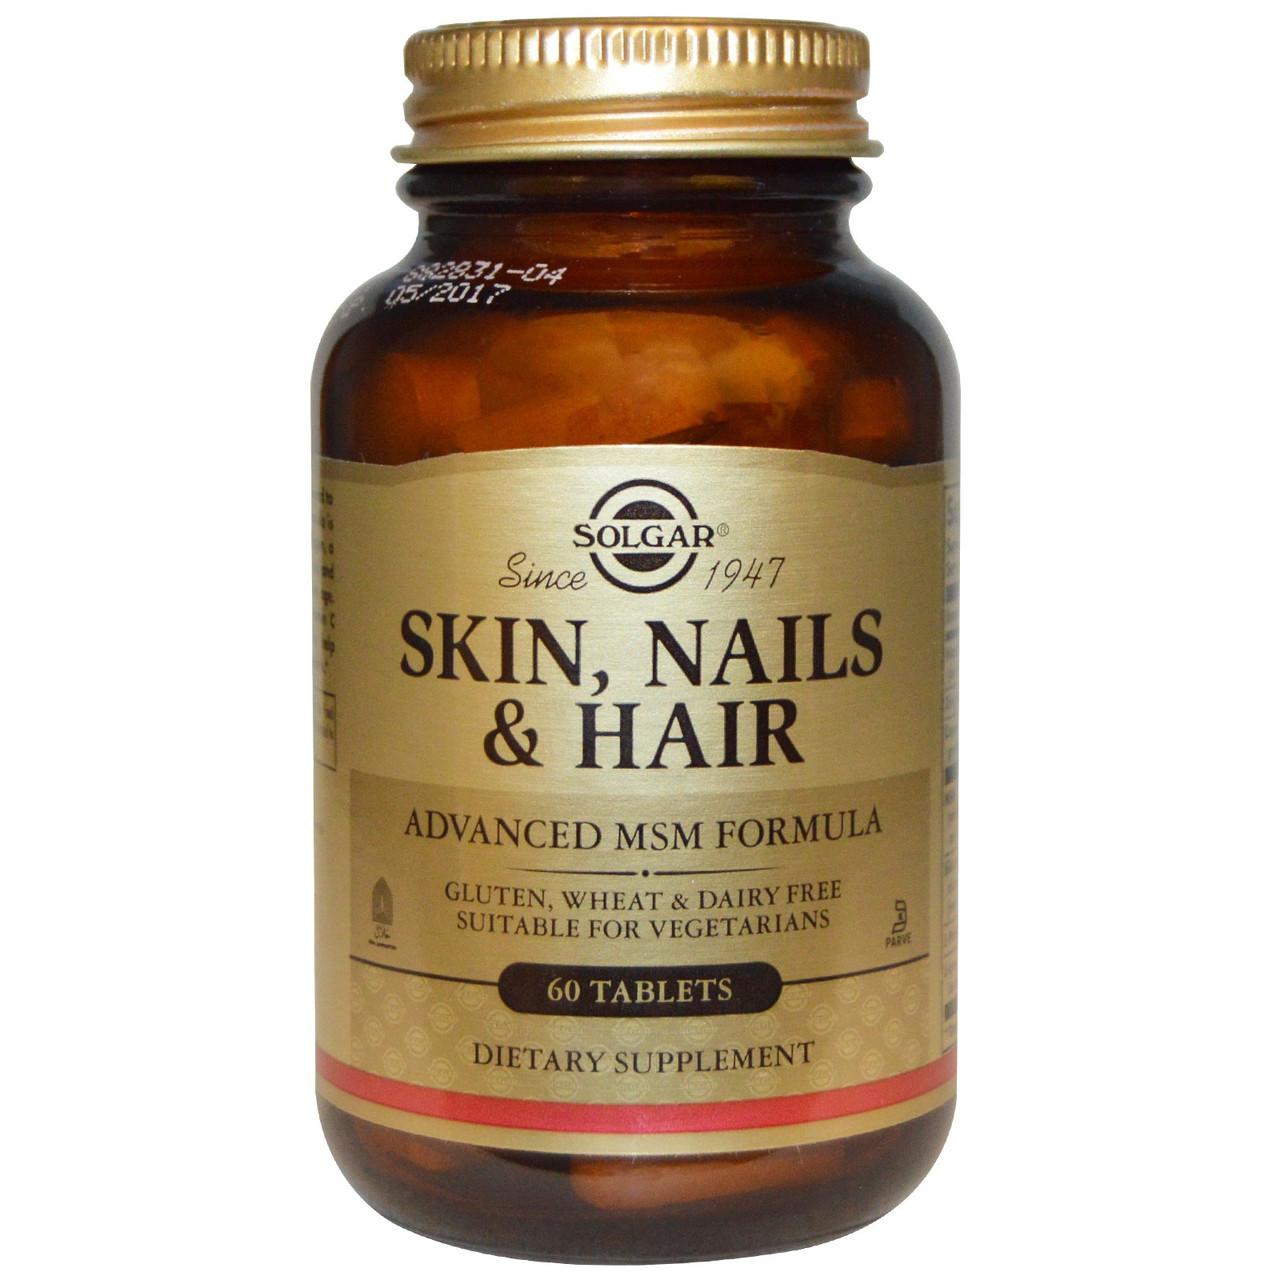 Iherb солгар кожа волосы ногти